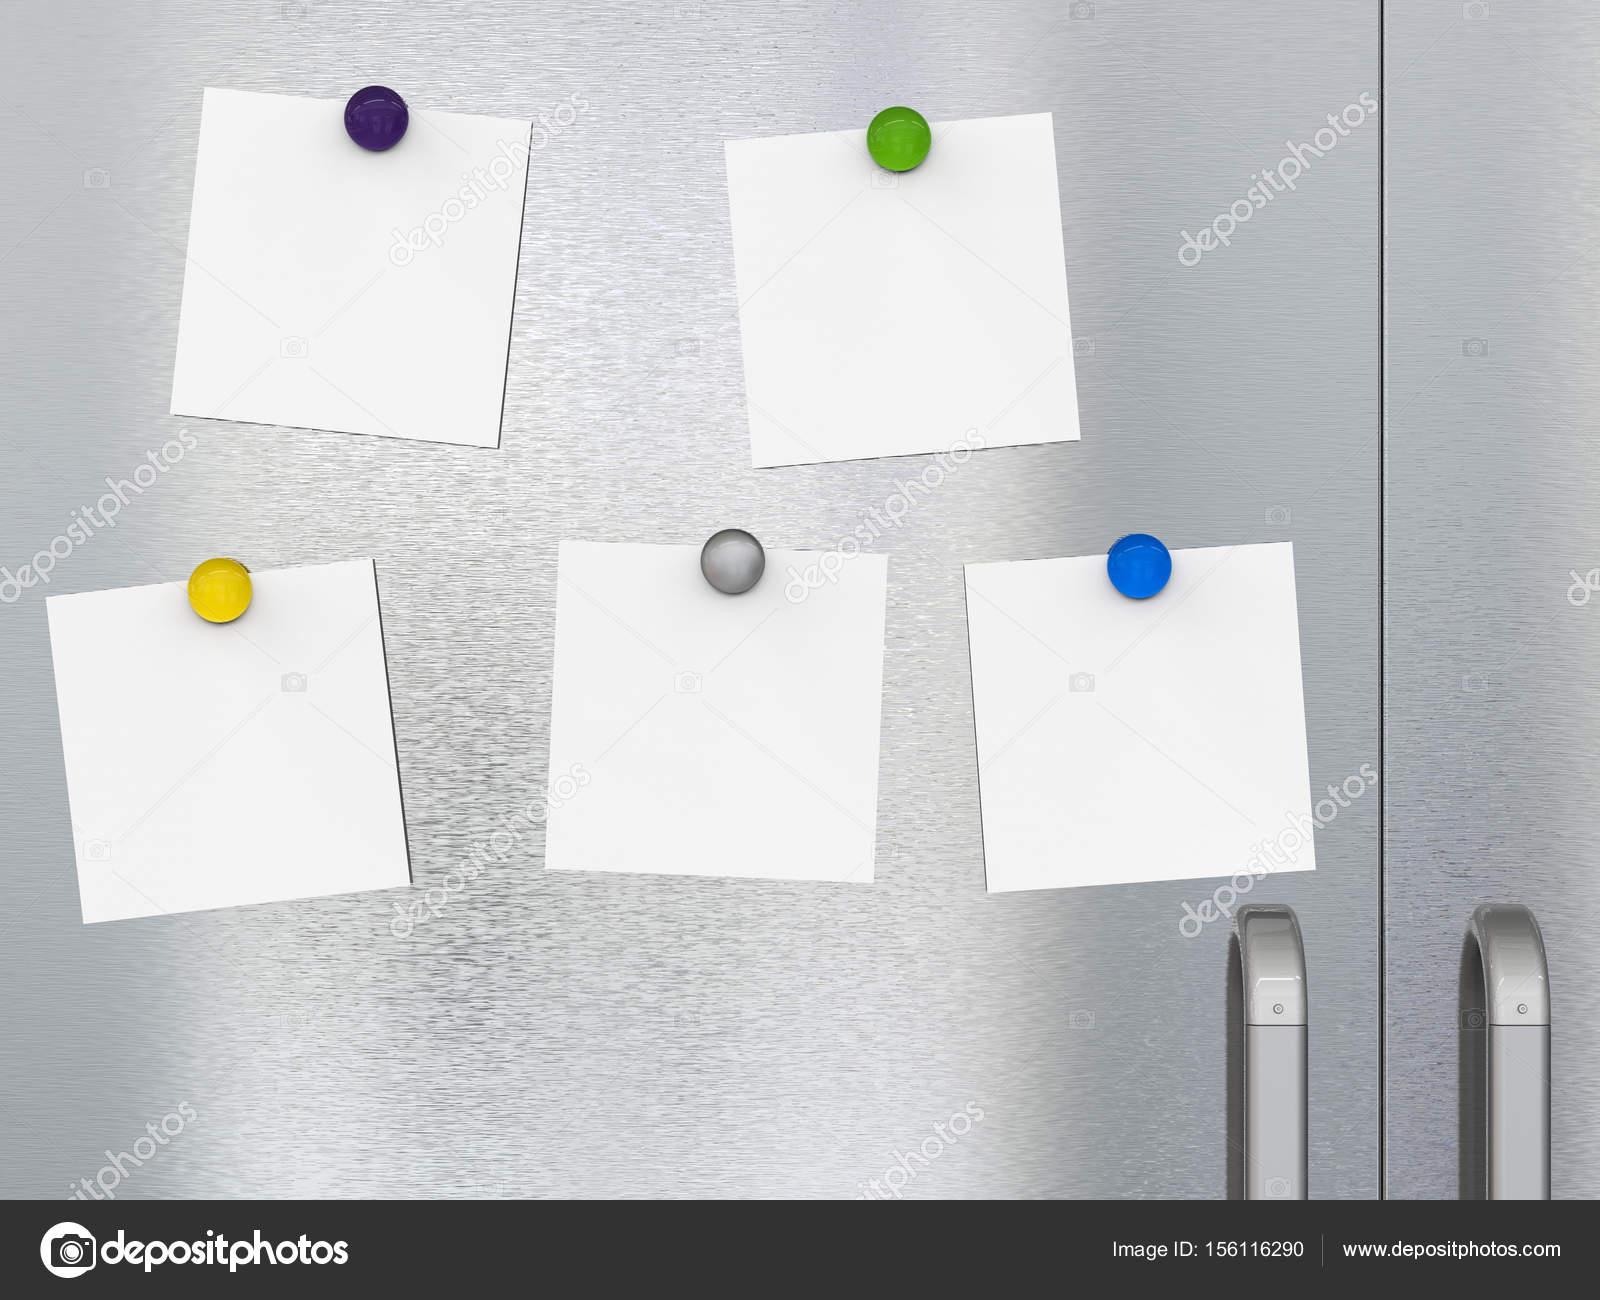 Kühlschrank Magnete : Leere notizen mit kühlschrank magnete u2014 stockfoto © phonlamai #156116290